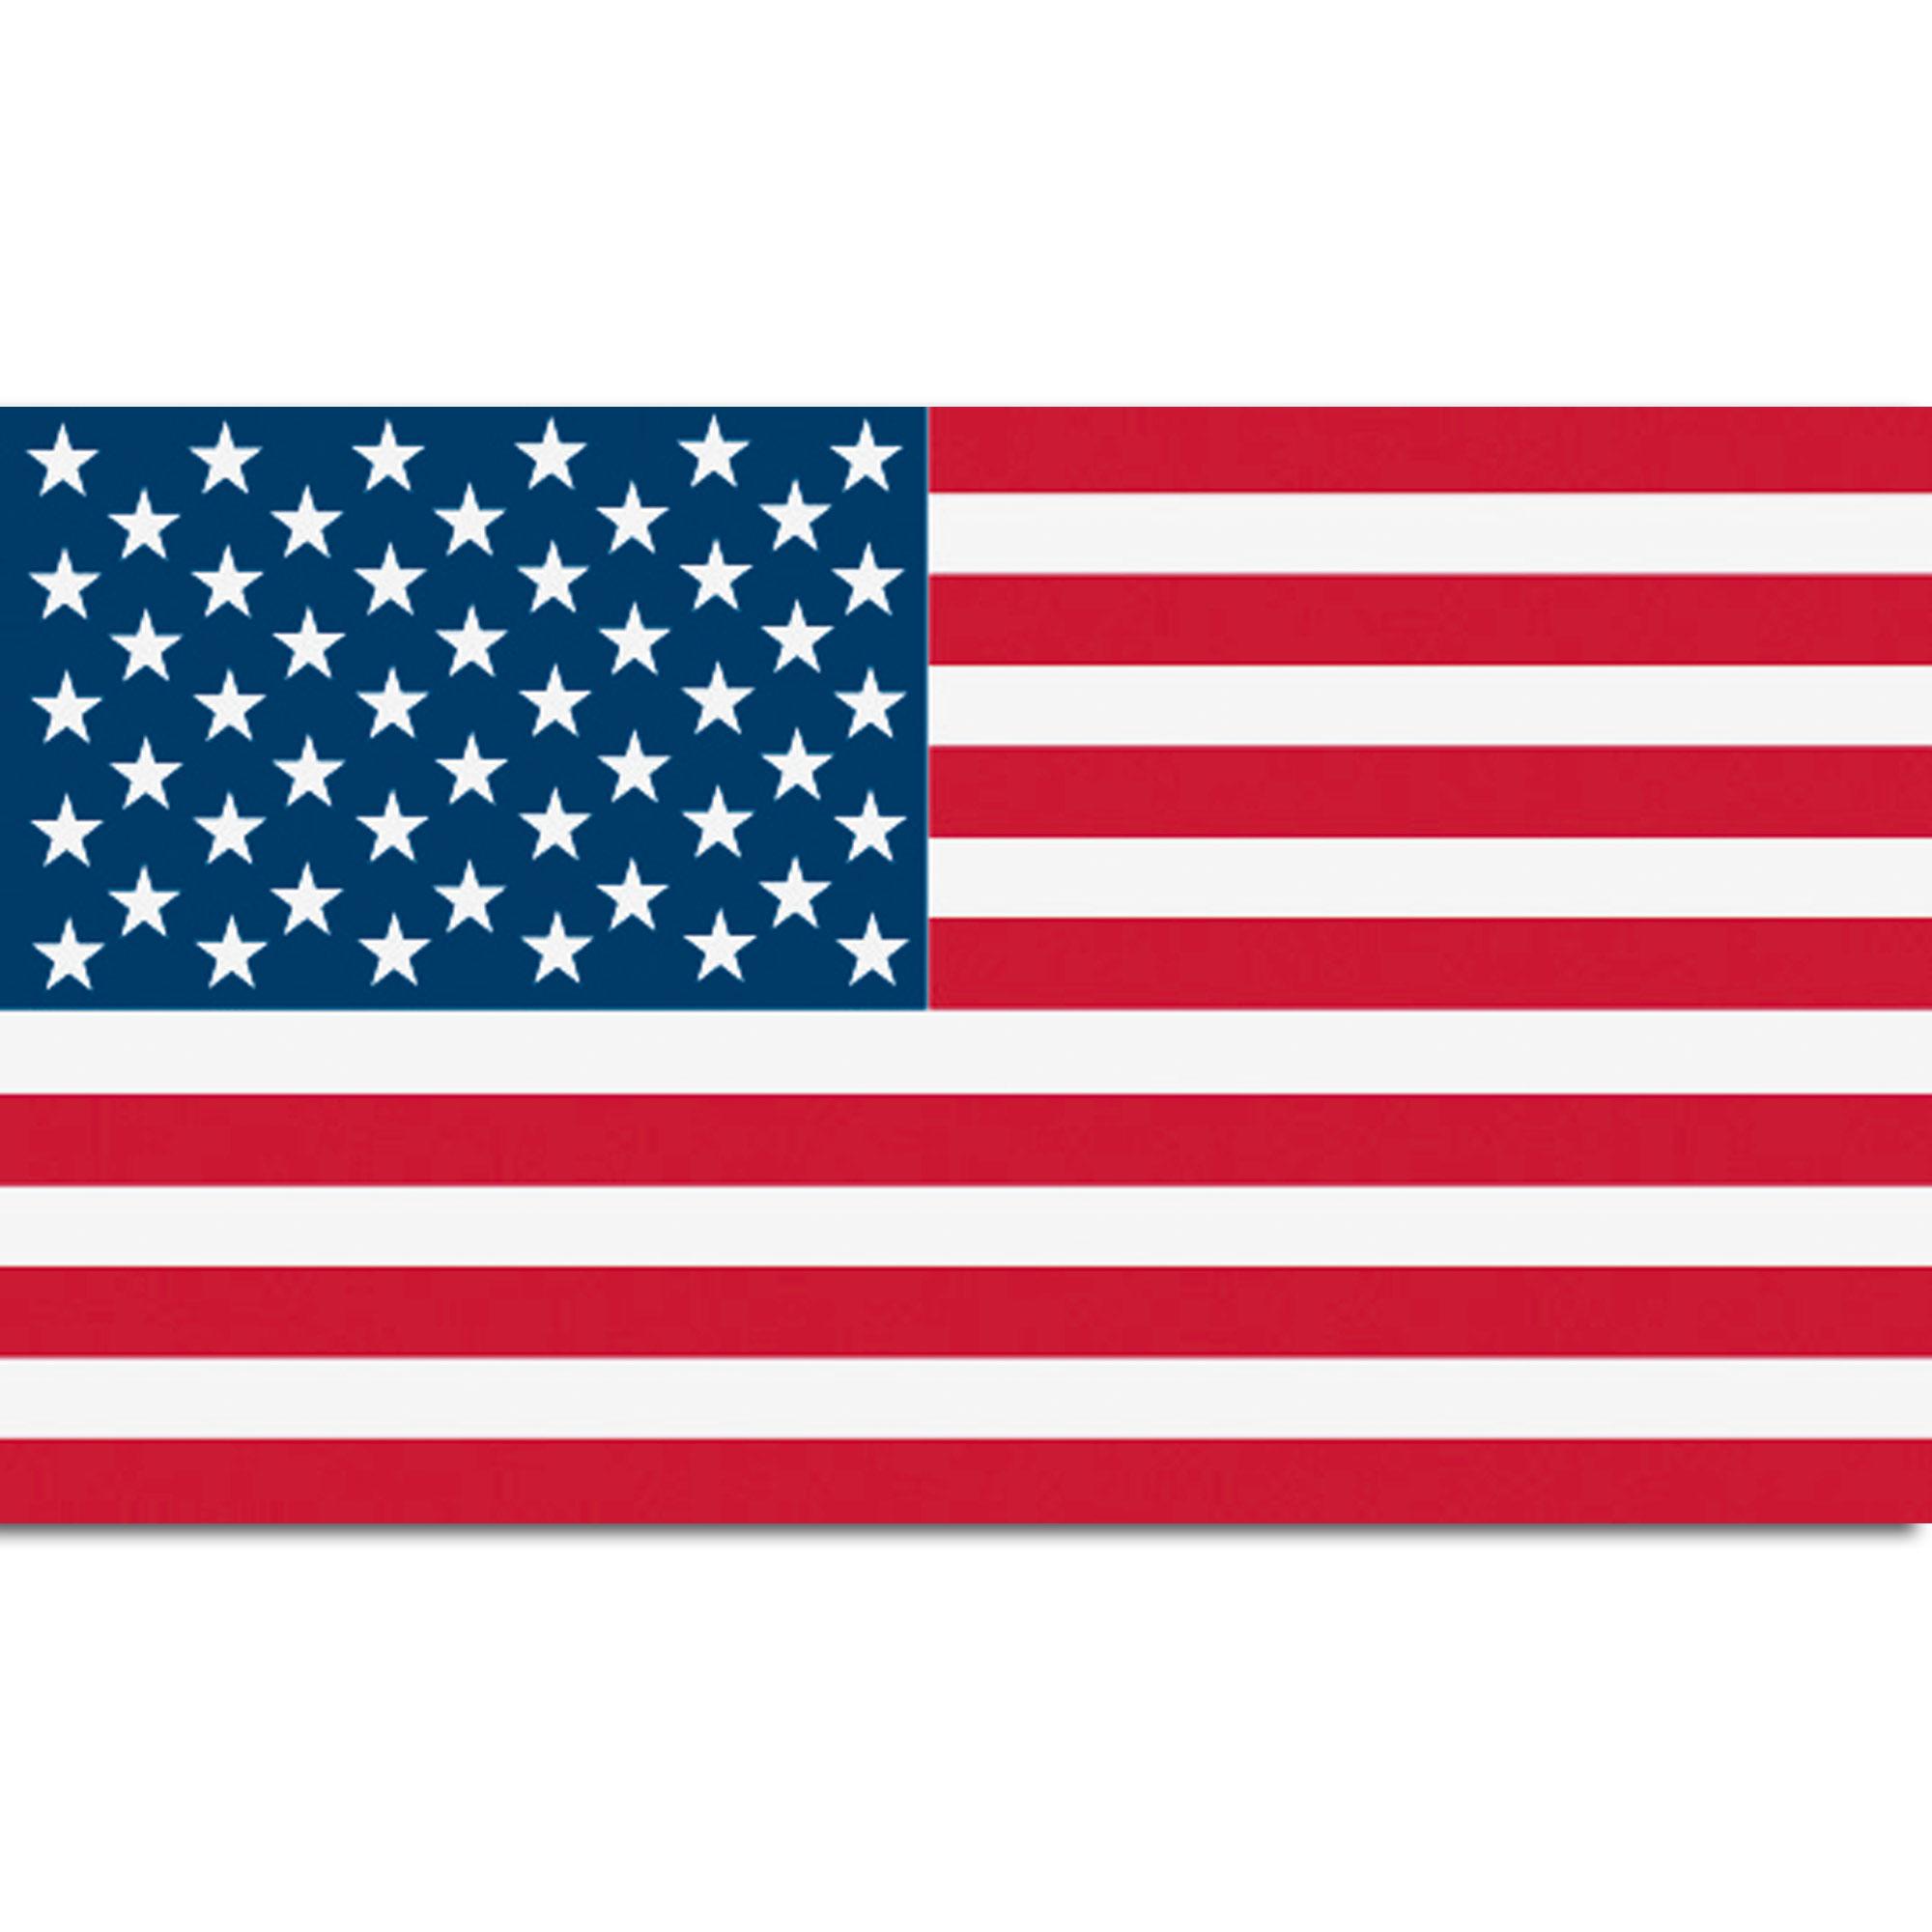 Flagge USA (Sternenbanner)